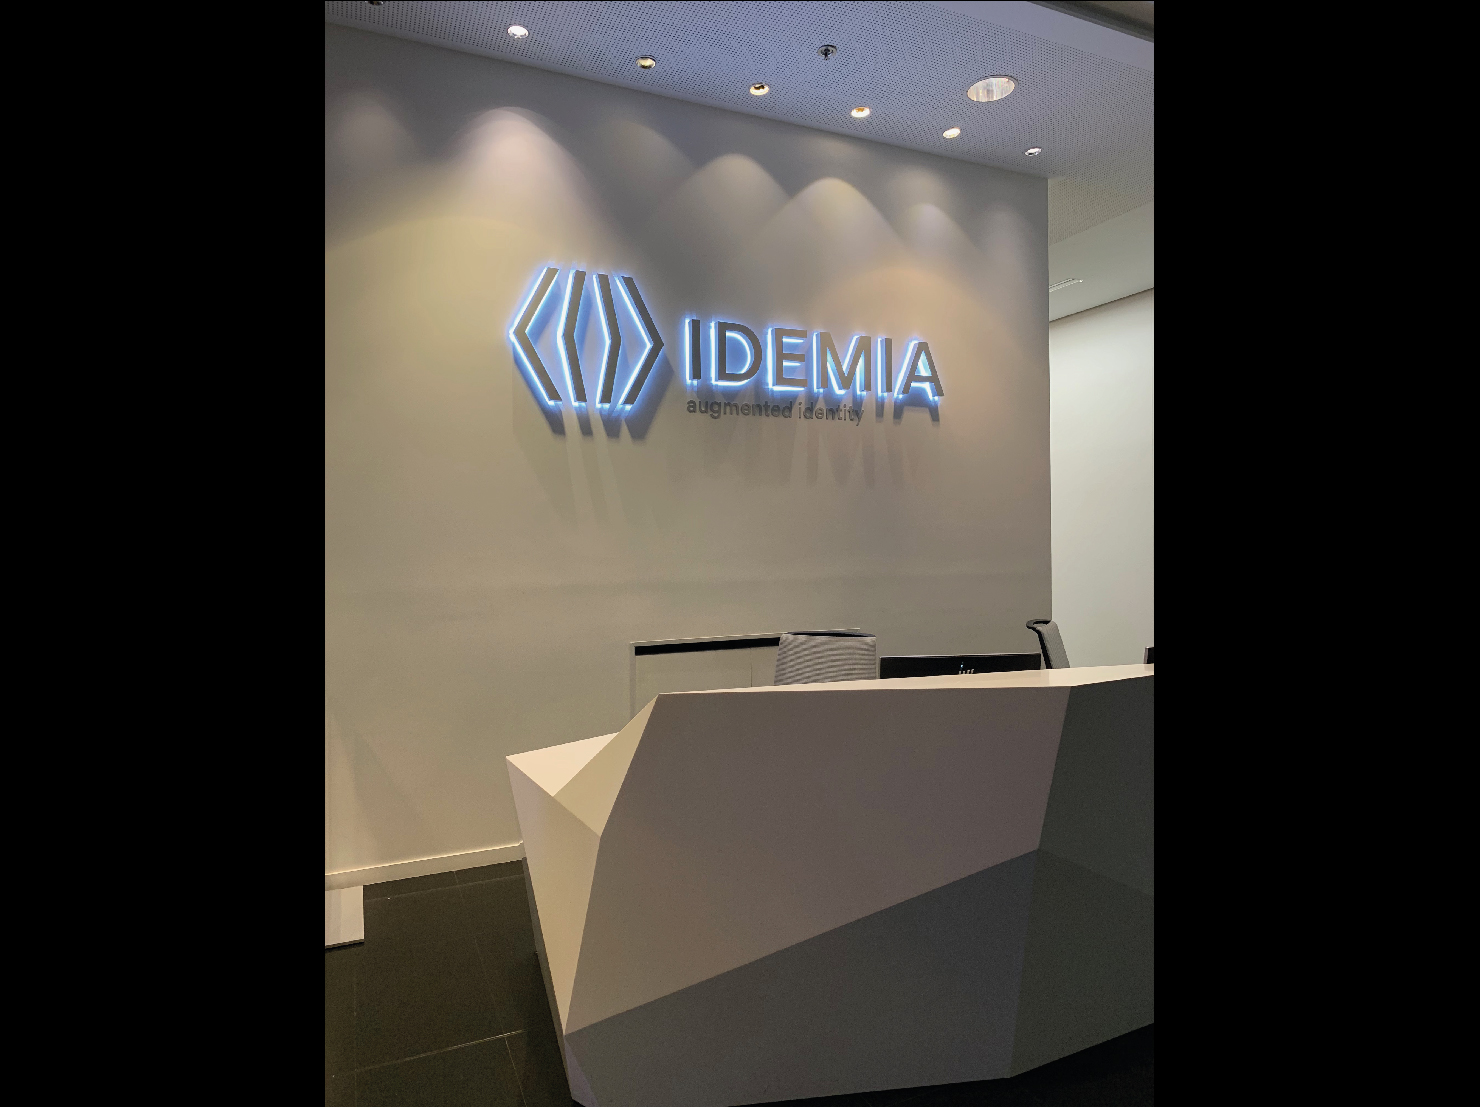 Idémia